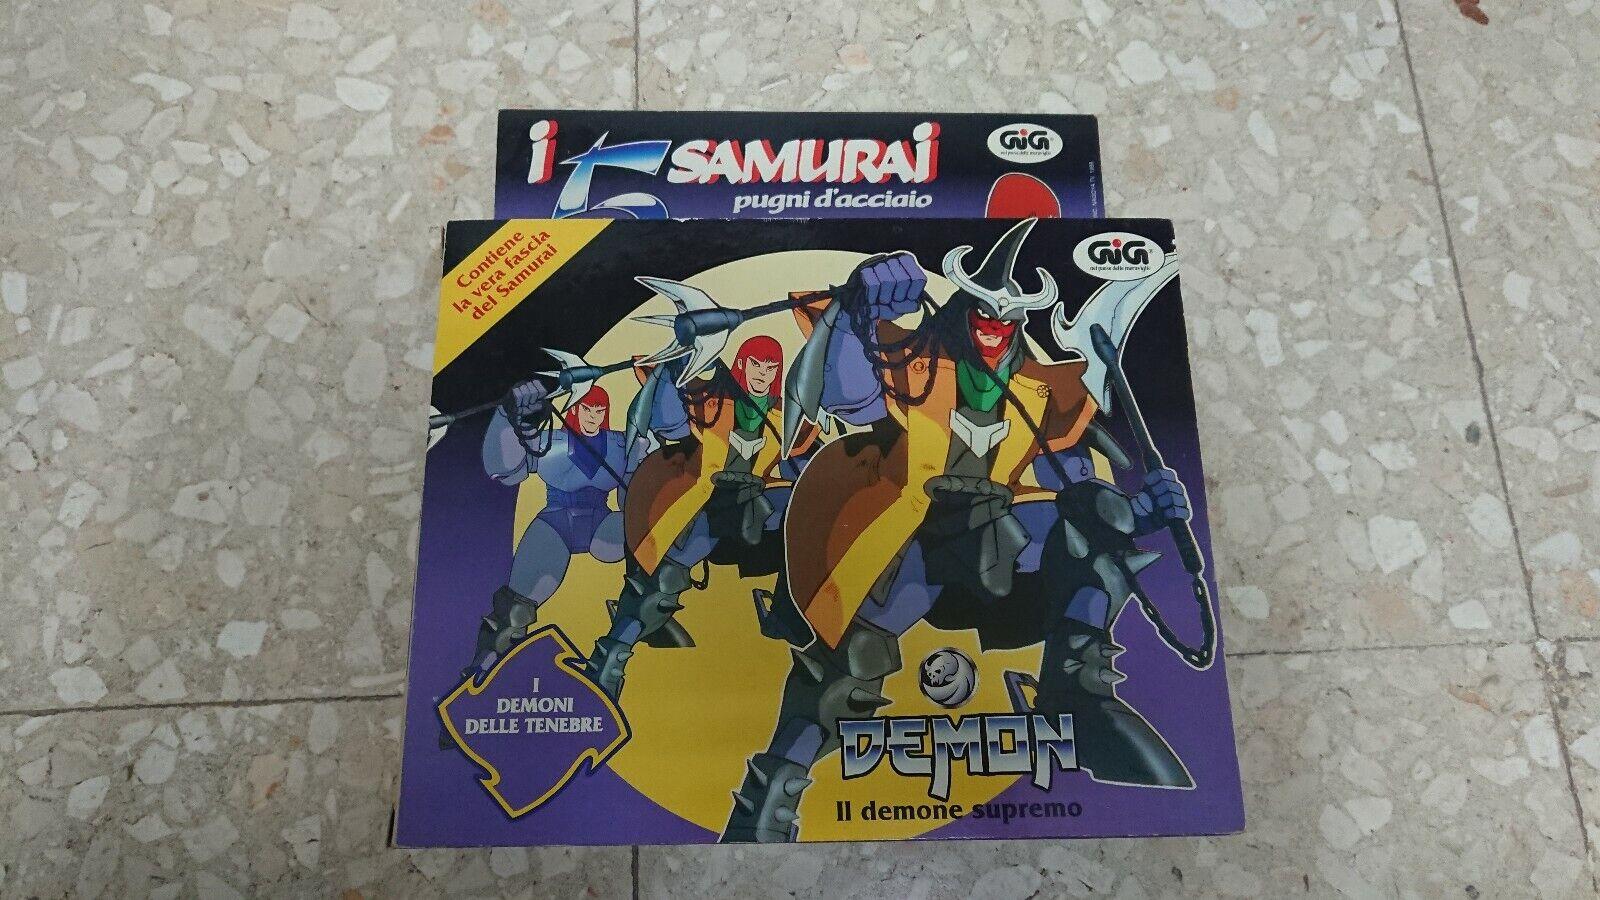 Los 5 Samurai. I 5 Samurai GiG. Yoroiden Samurai troopers. Samurai warriors